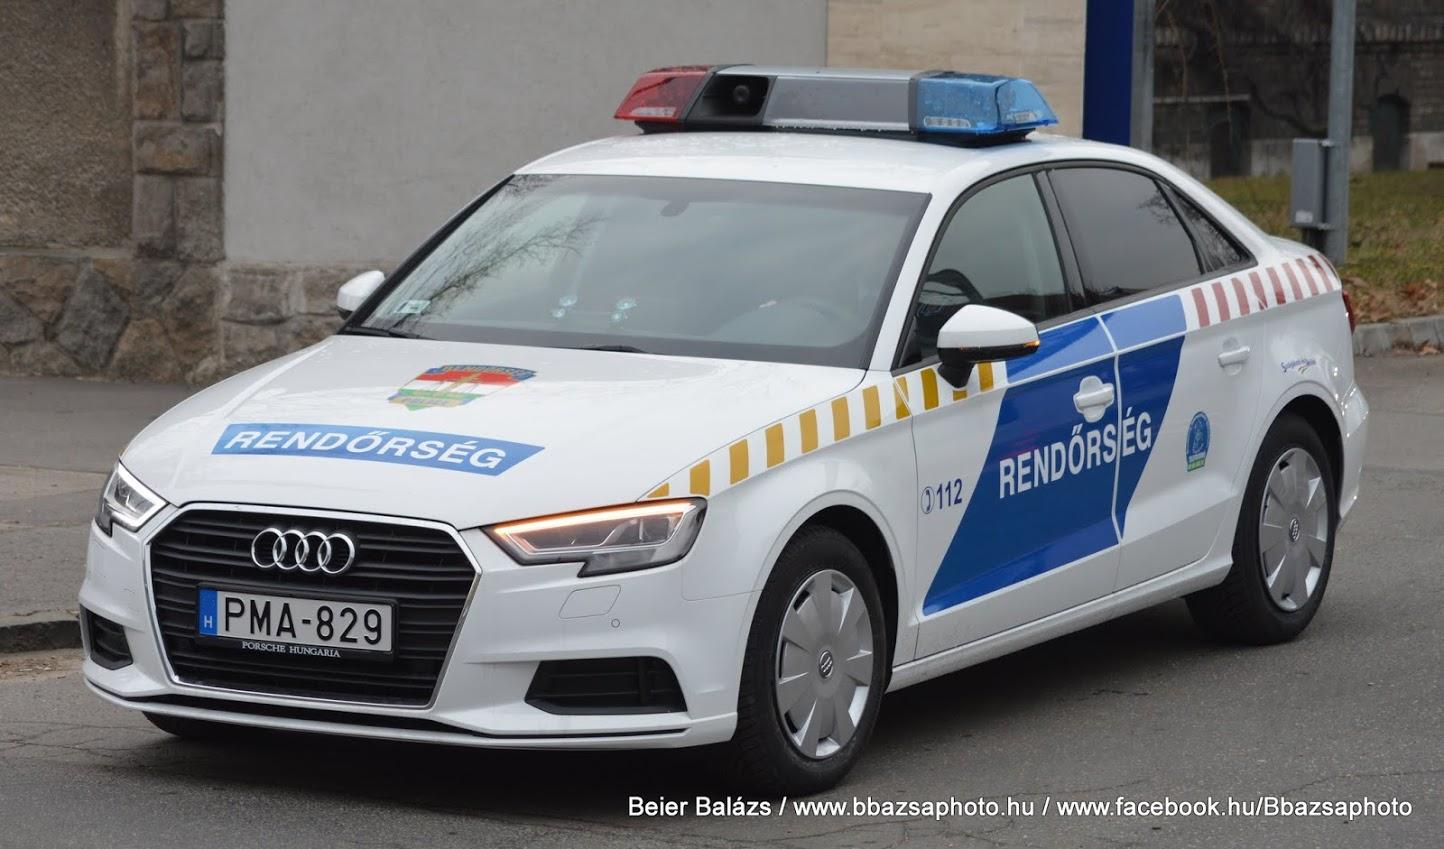 Audi A3 – Hella